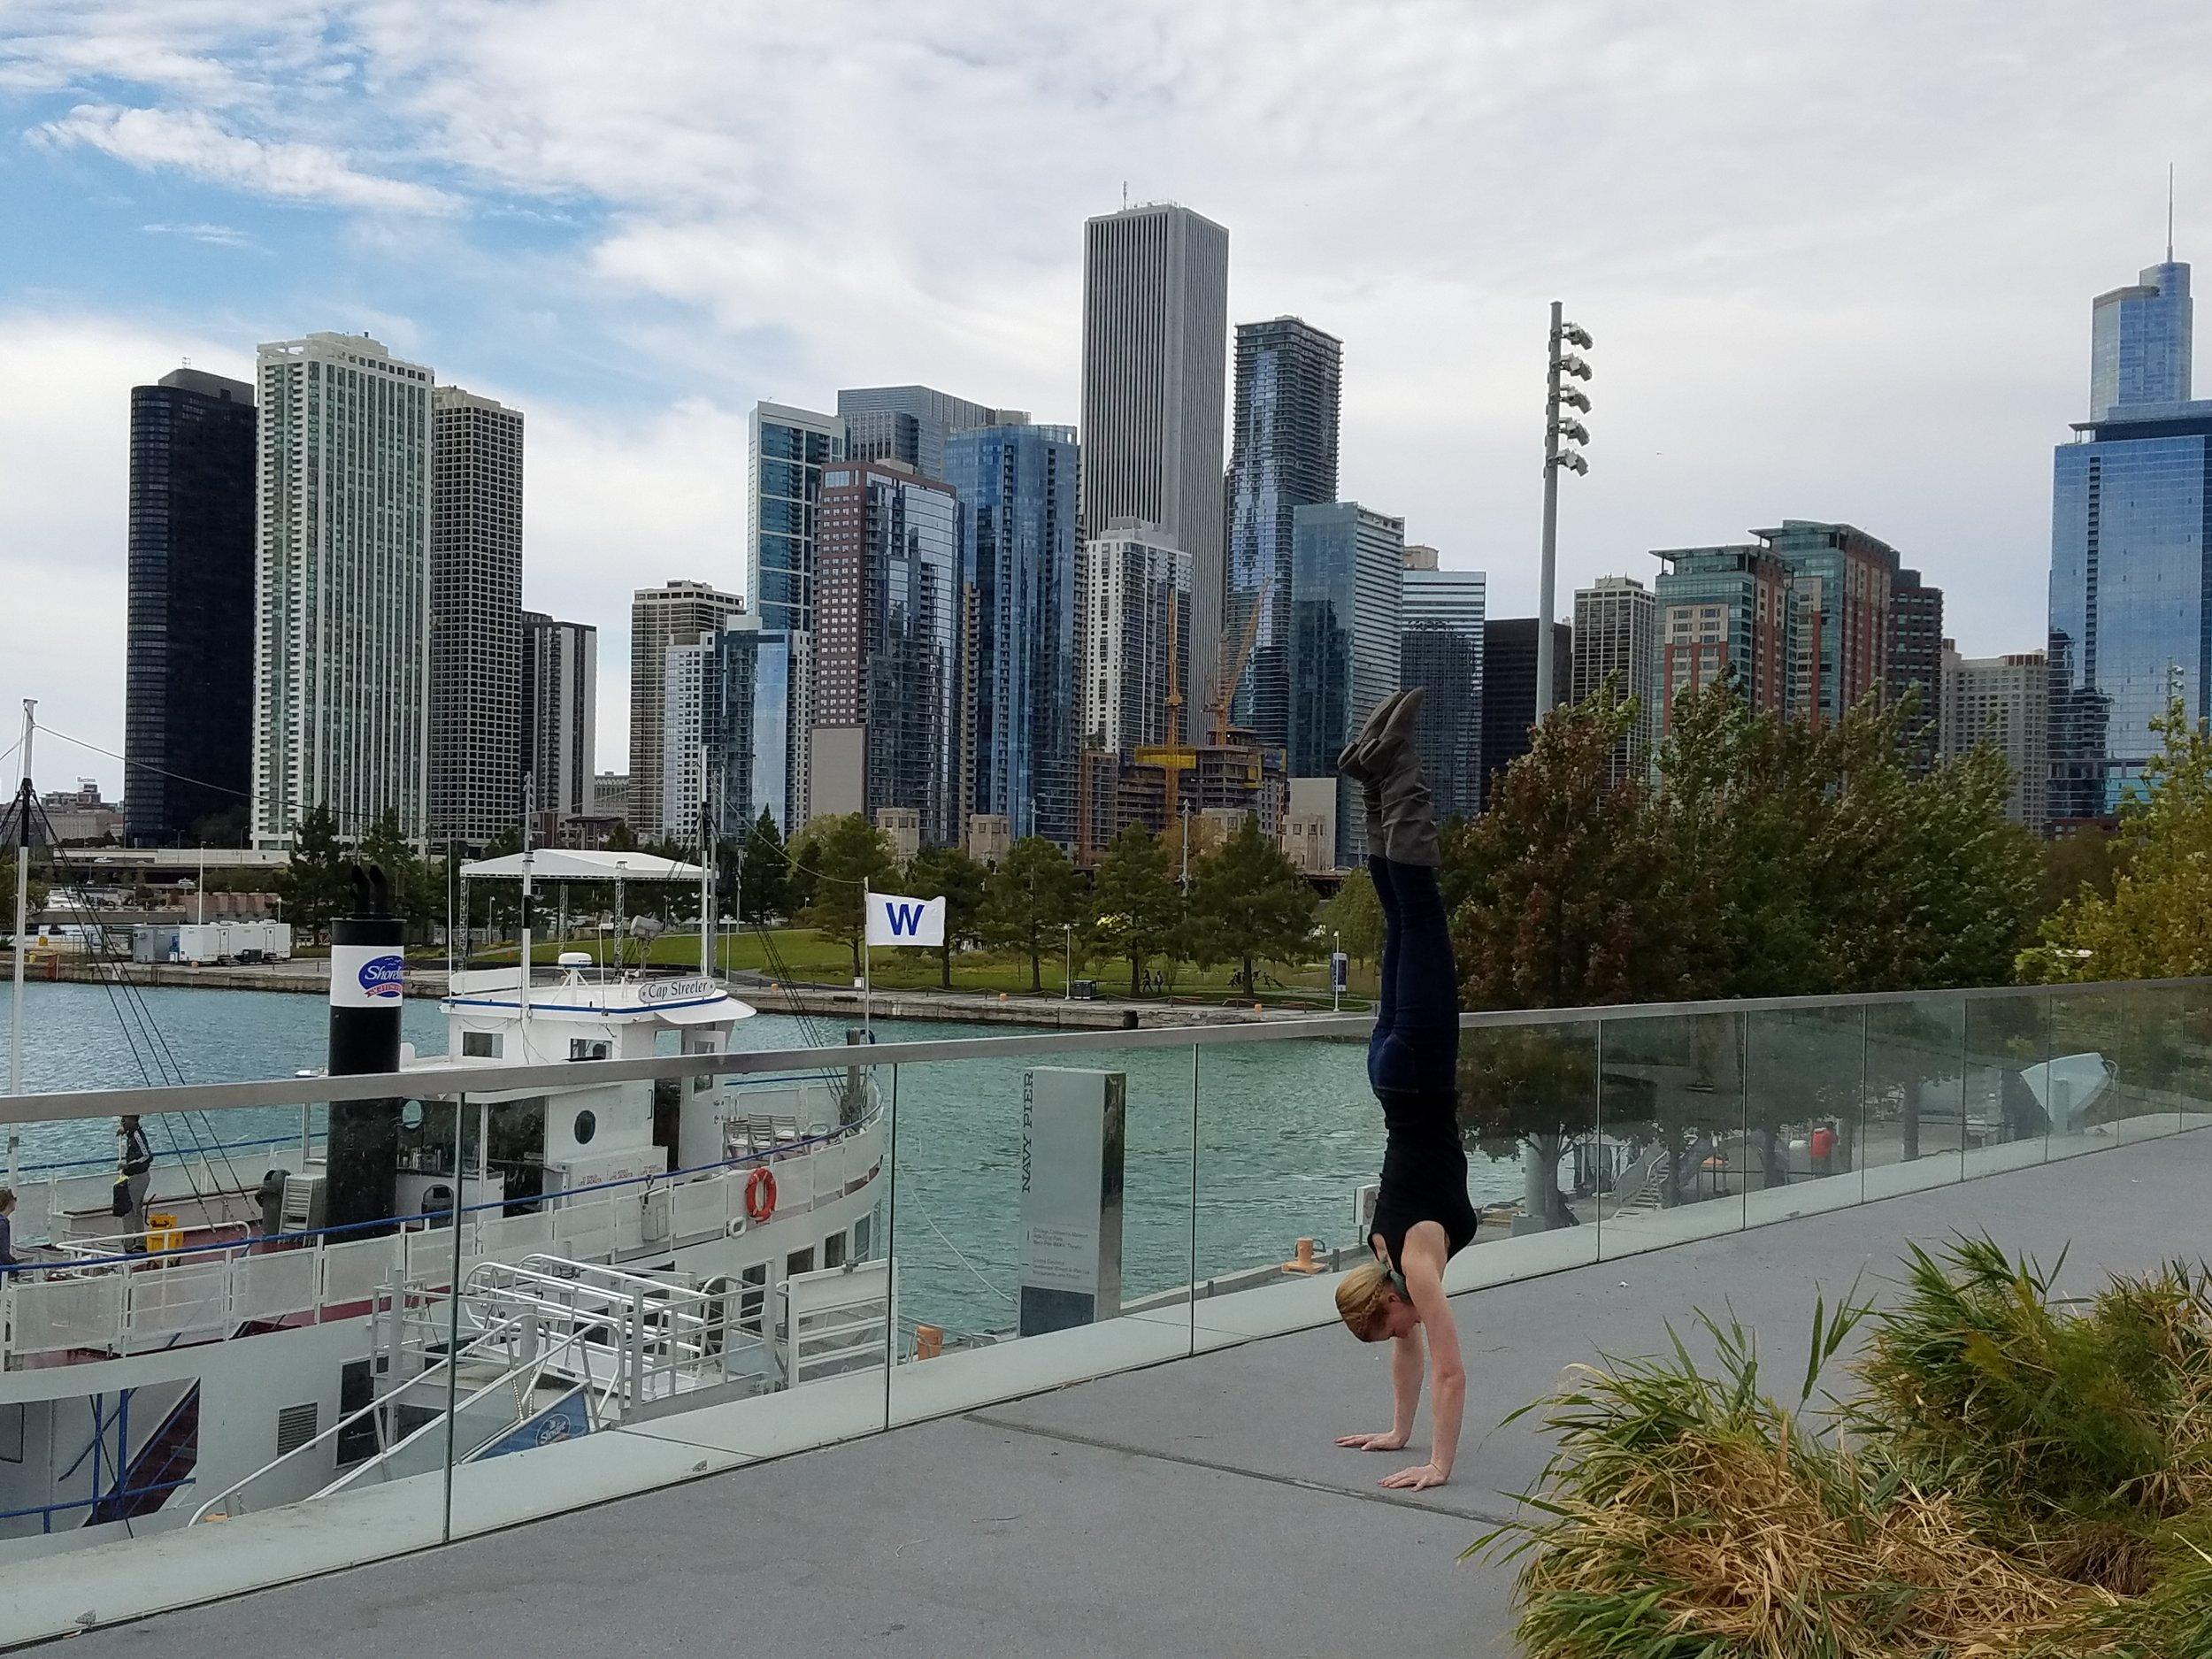 Handstand at Navy Pier